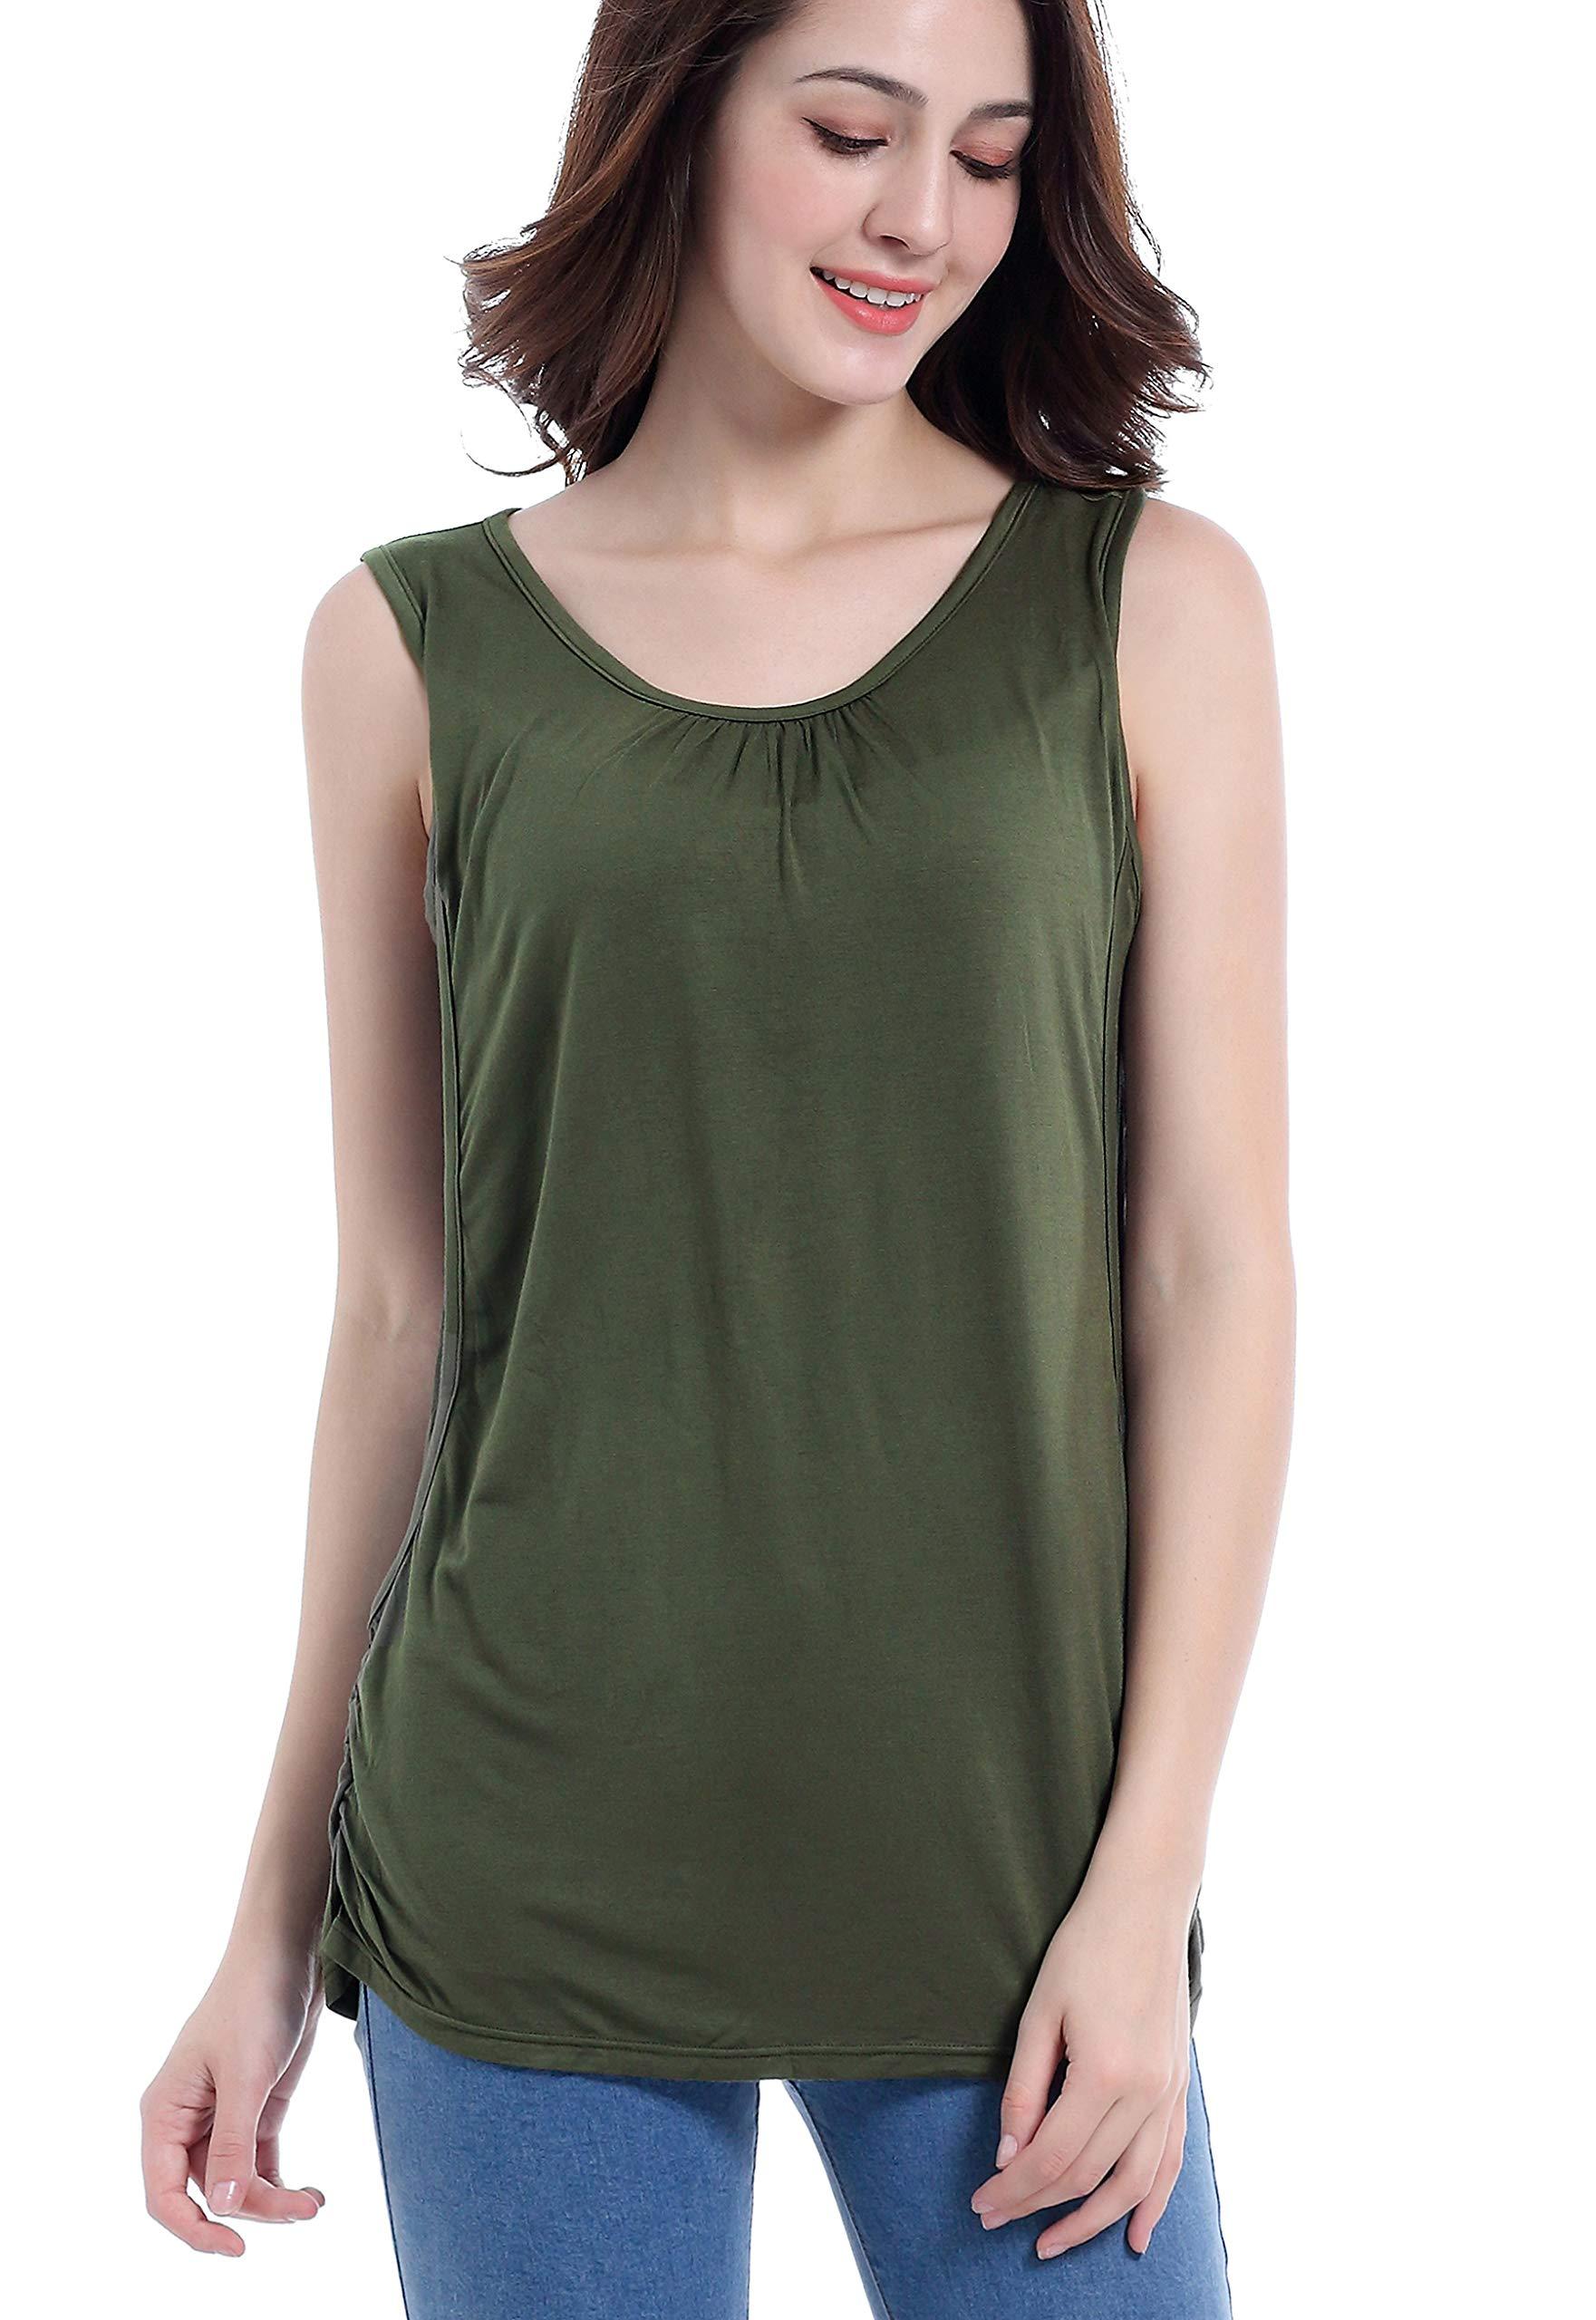 SUIEK Maternity Nursing Shirt Breastfeeding Tank Tops Cami Summer Clothes (Small, Army Green)